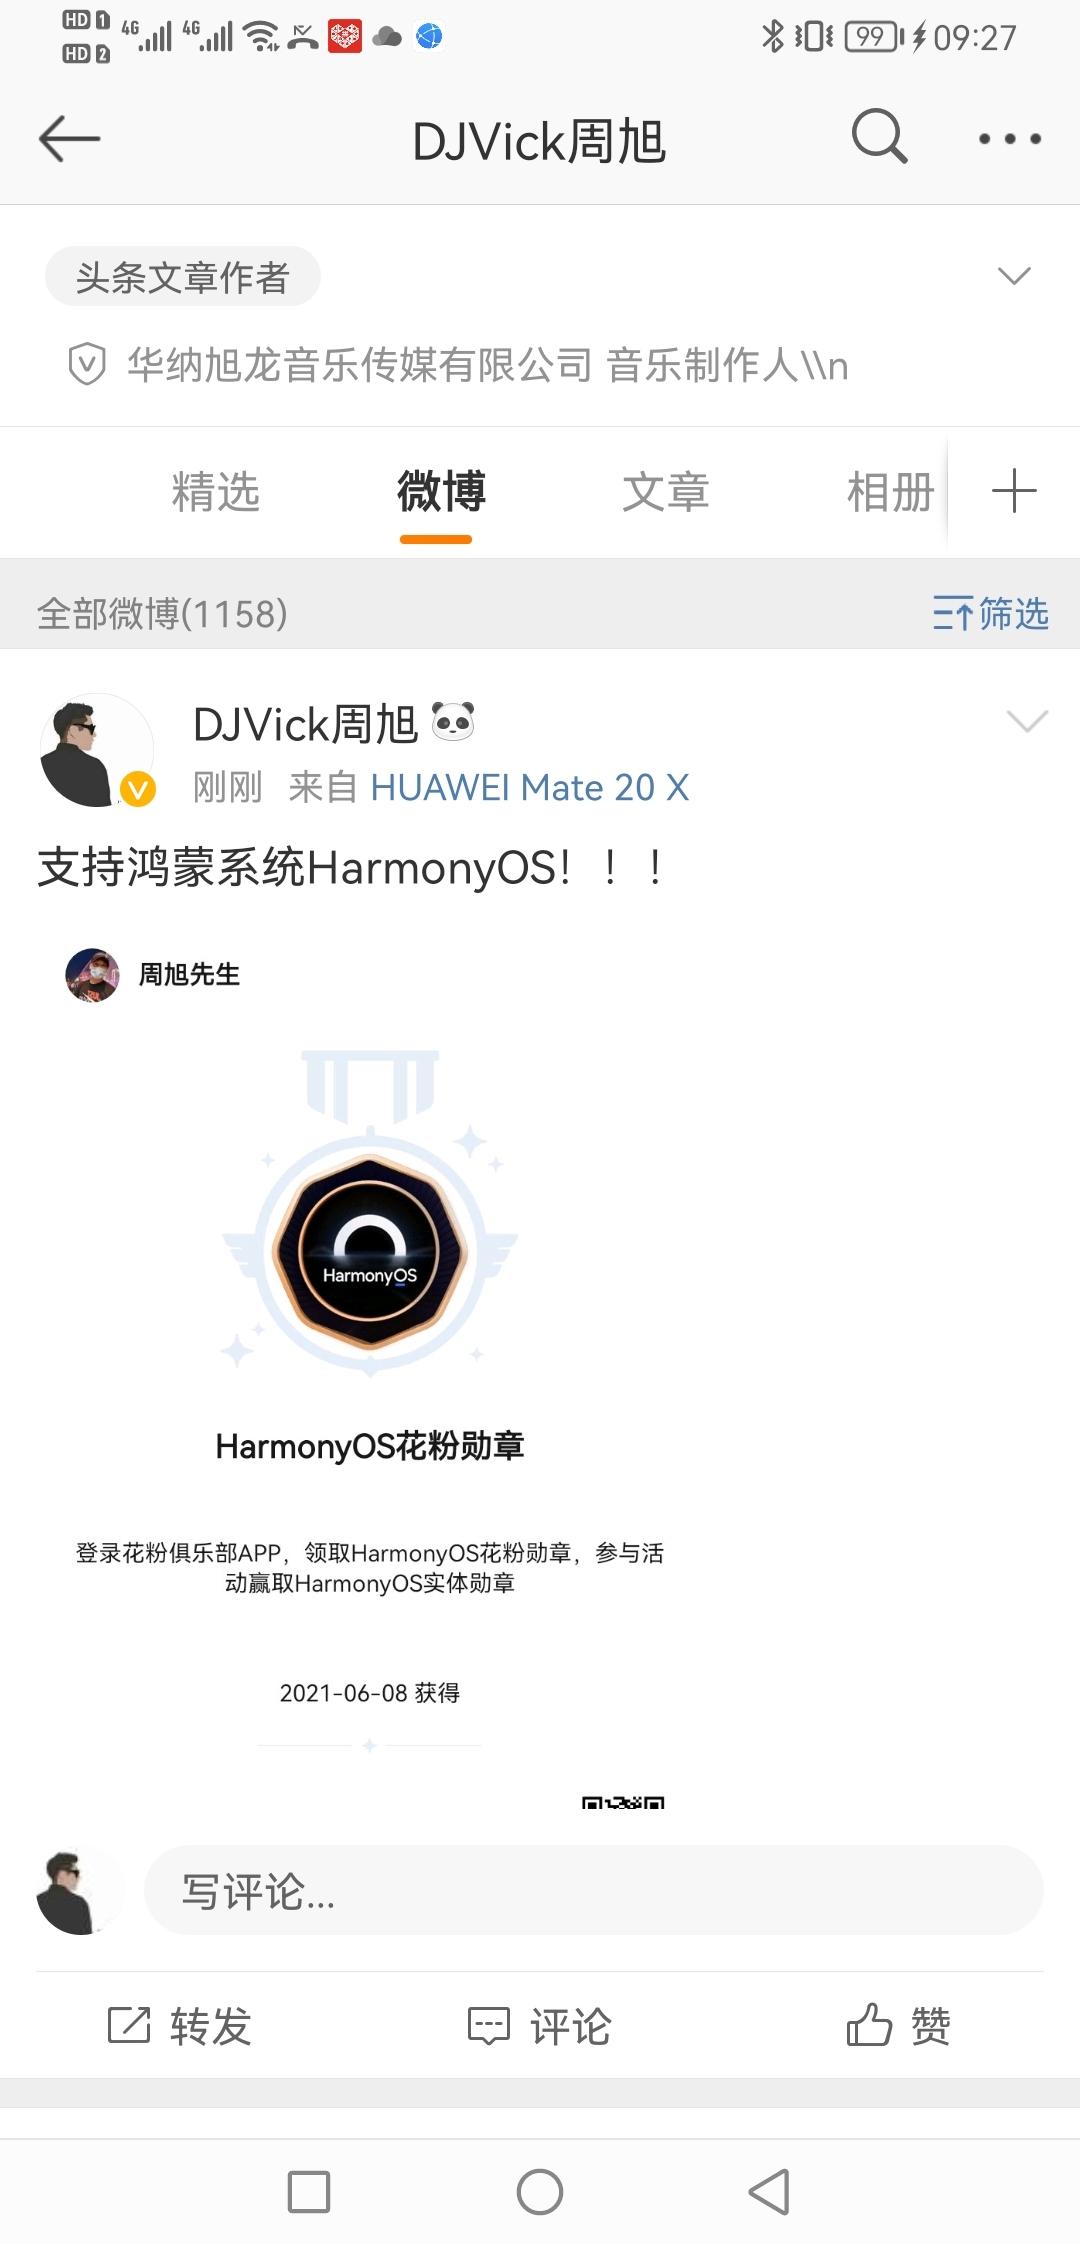 Screenshot_20210612_092739_com.sina.weibo.jpg